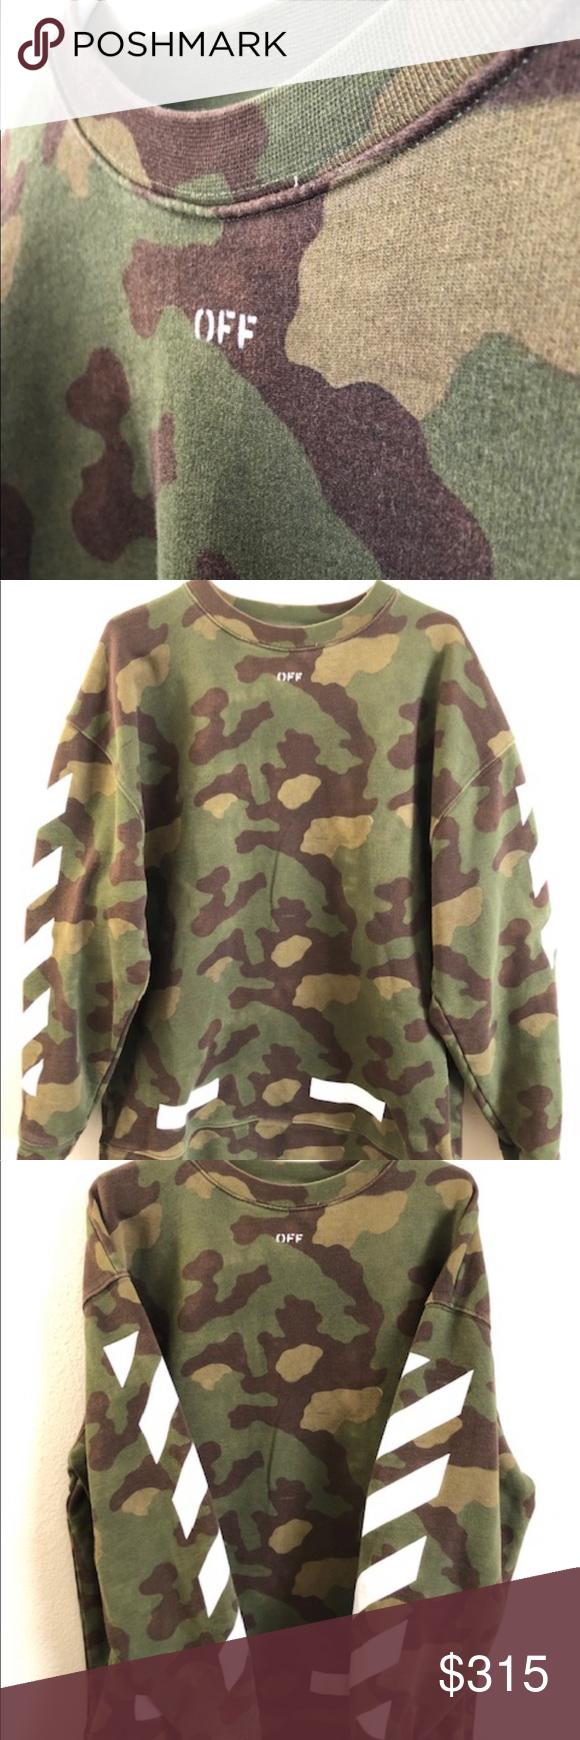 Off White Camo Crewneck White Camo Clothes Design Sweatshirt Tops [ 1740 x 580 Pixel ]